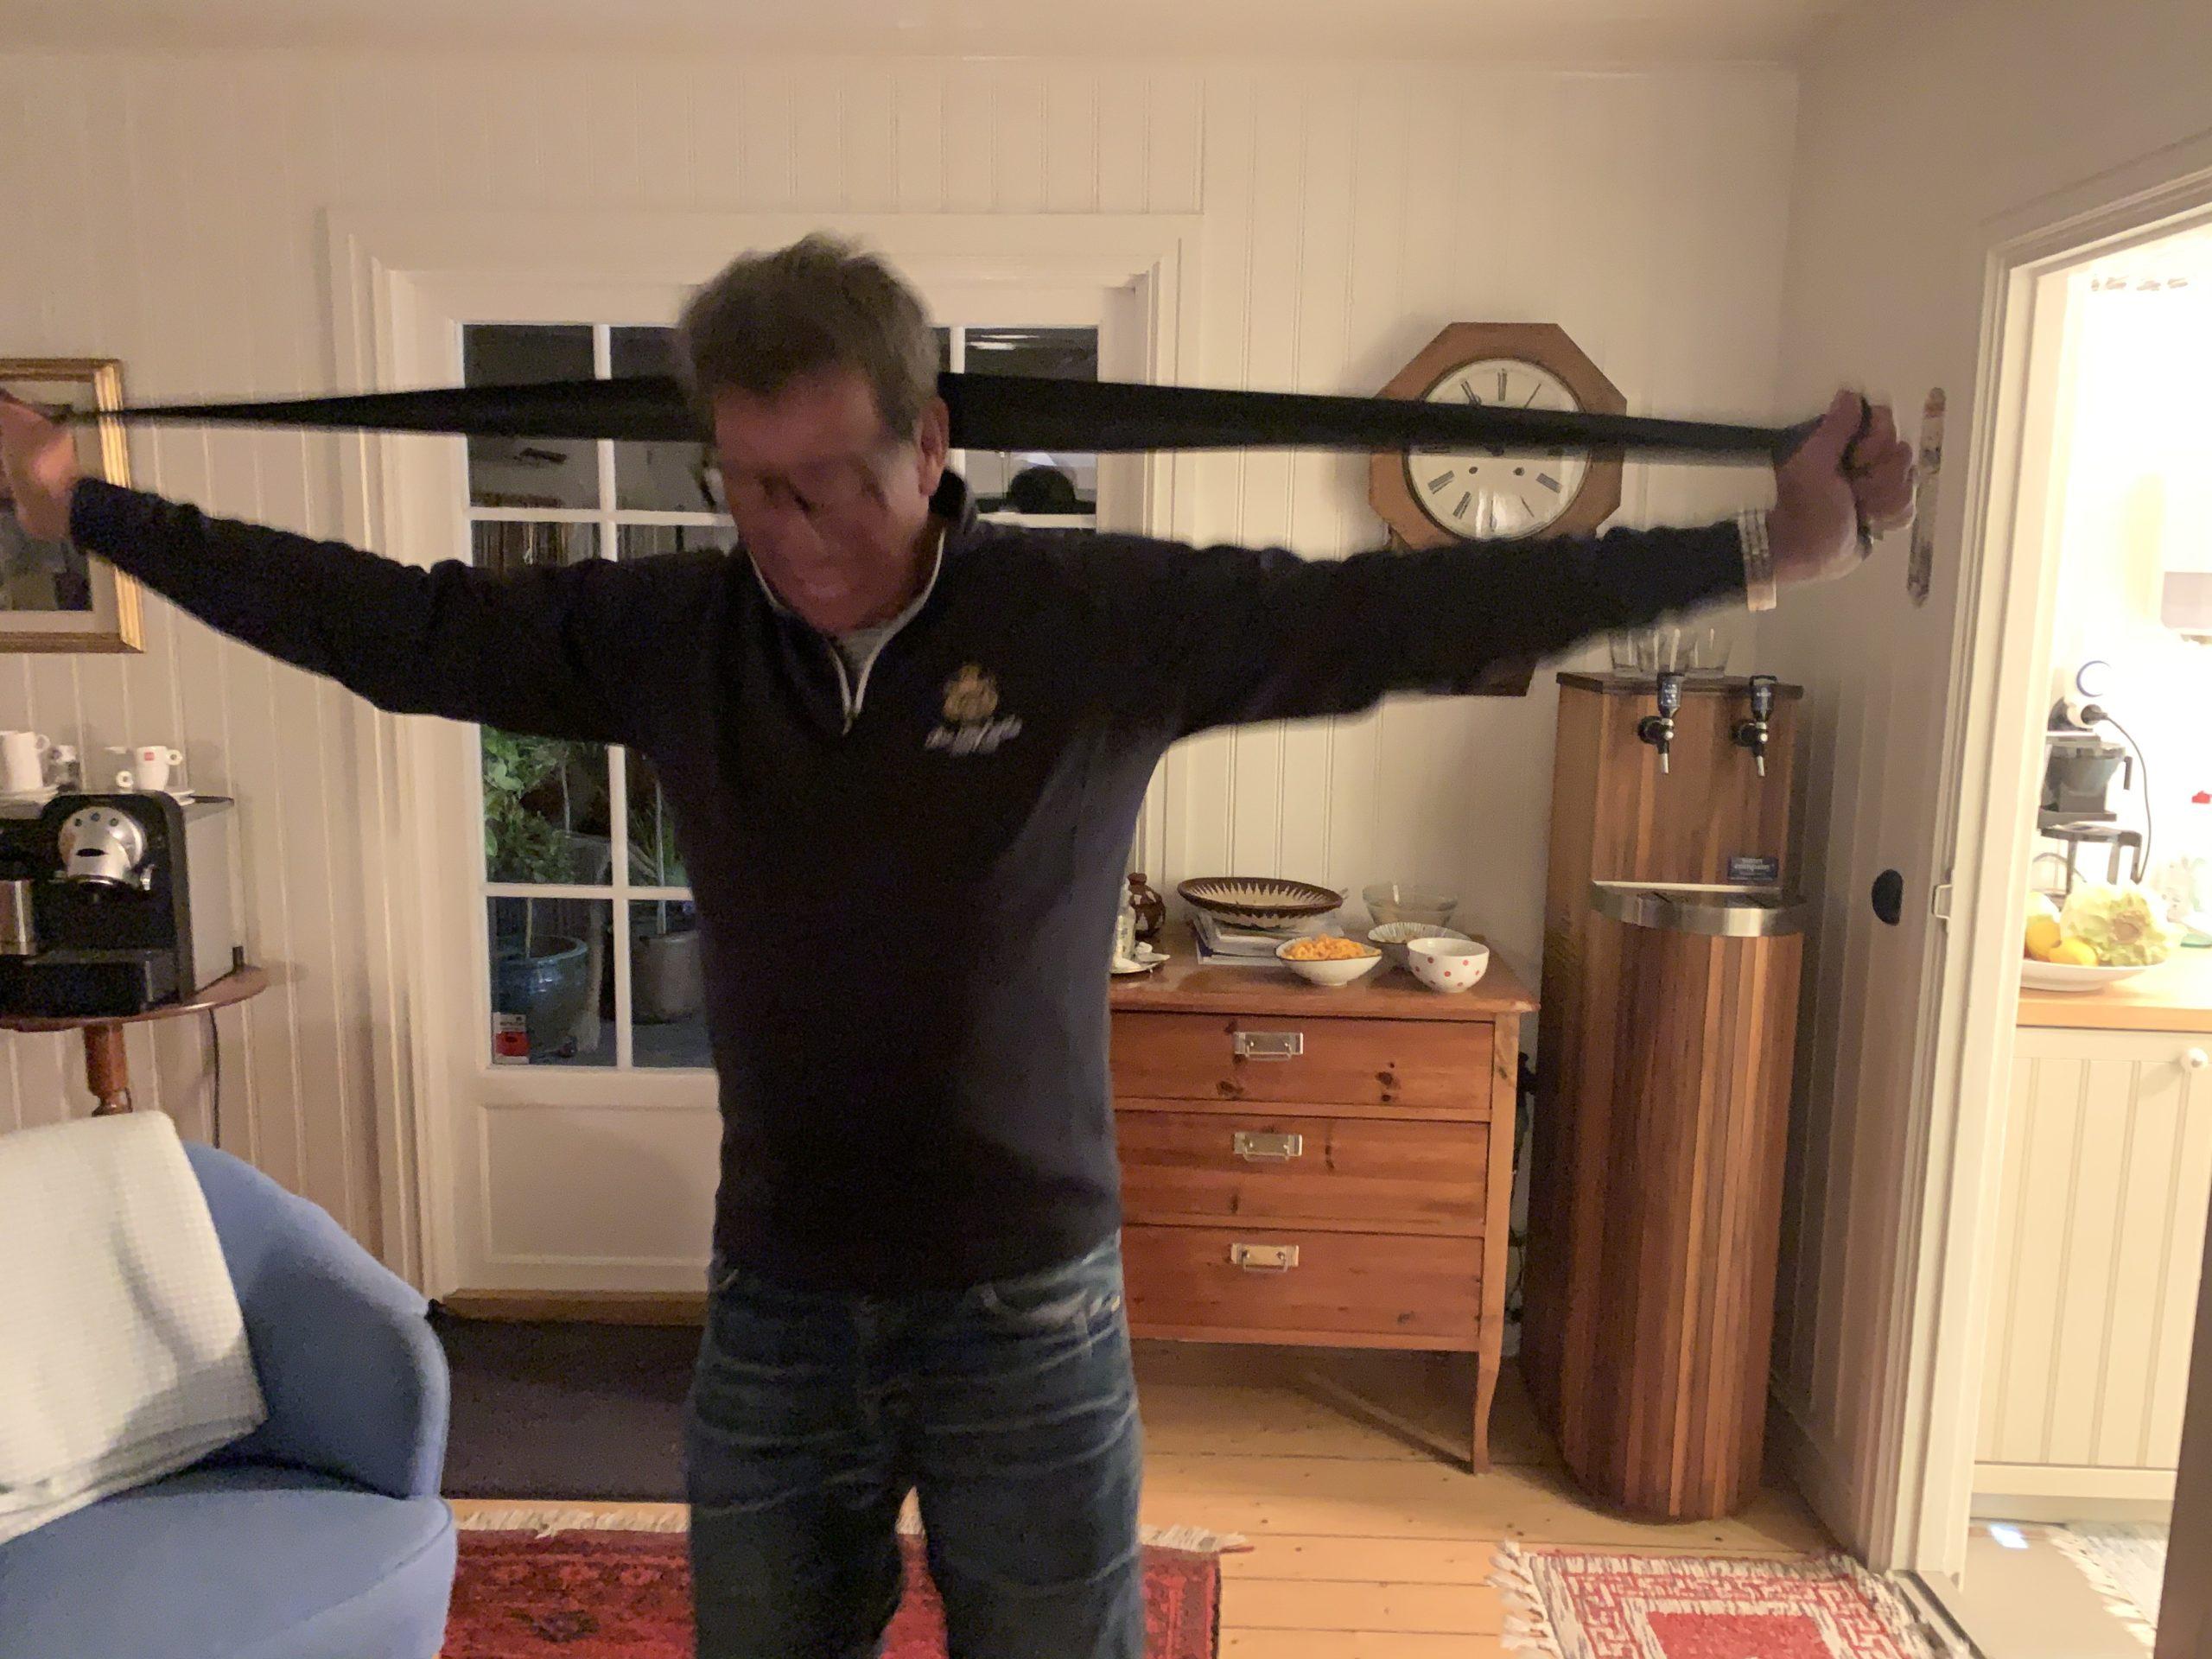 Richard testar sina nya träningsband